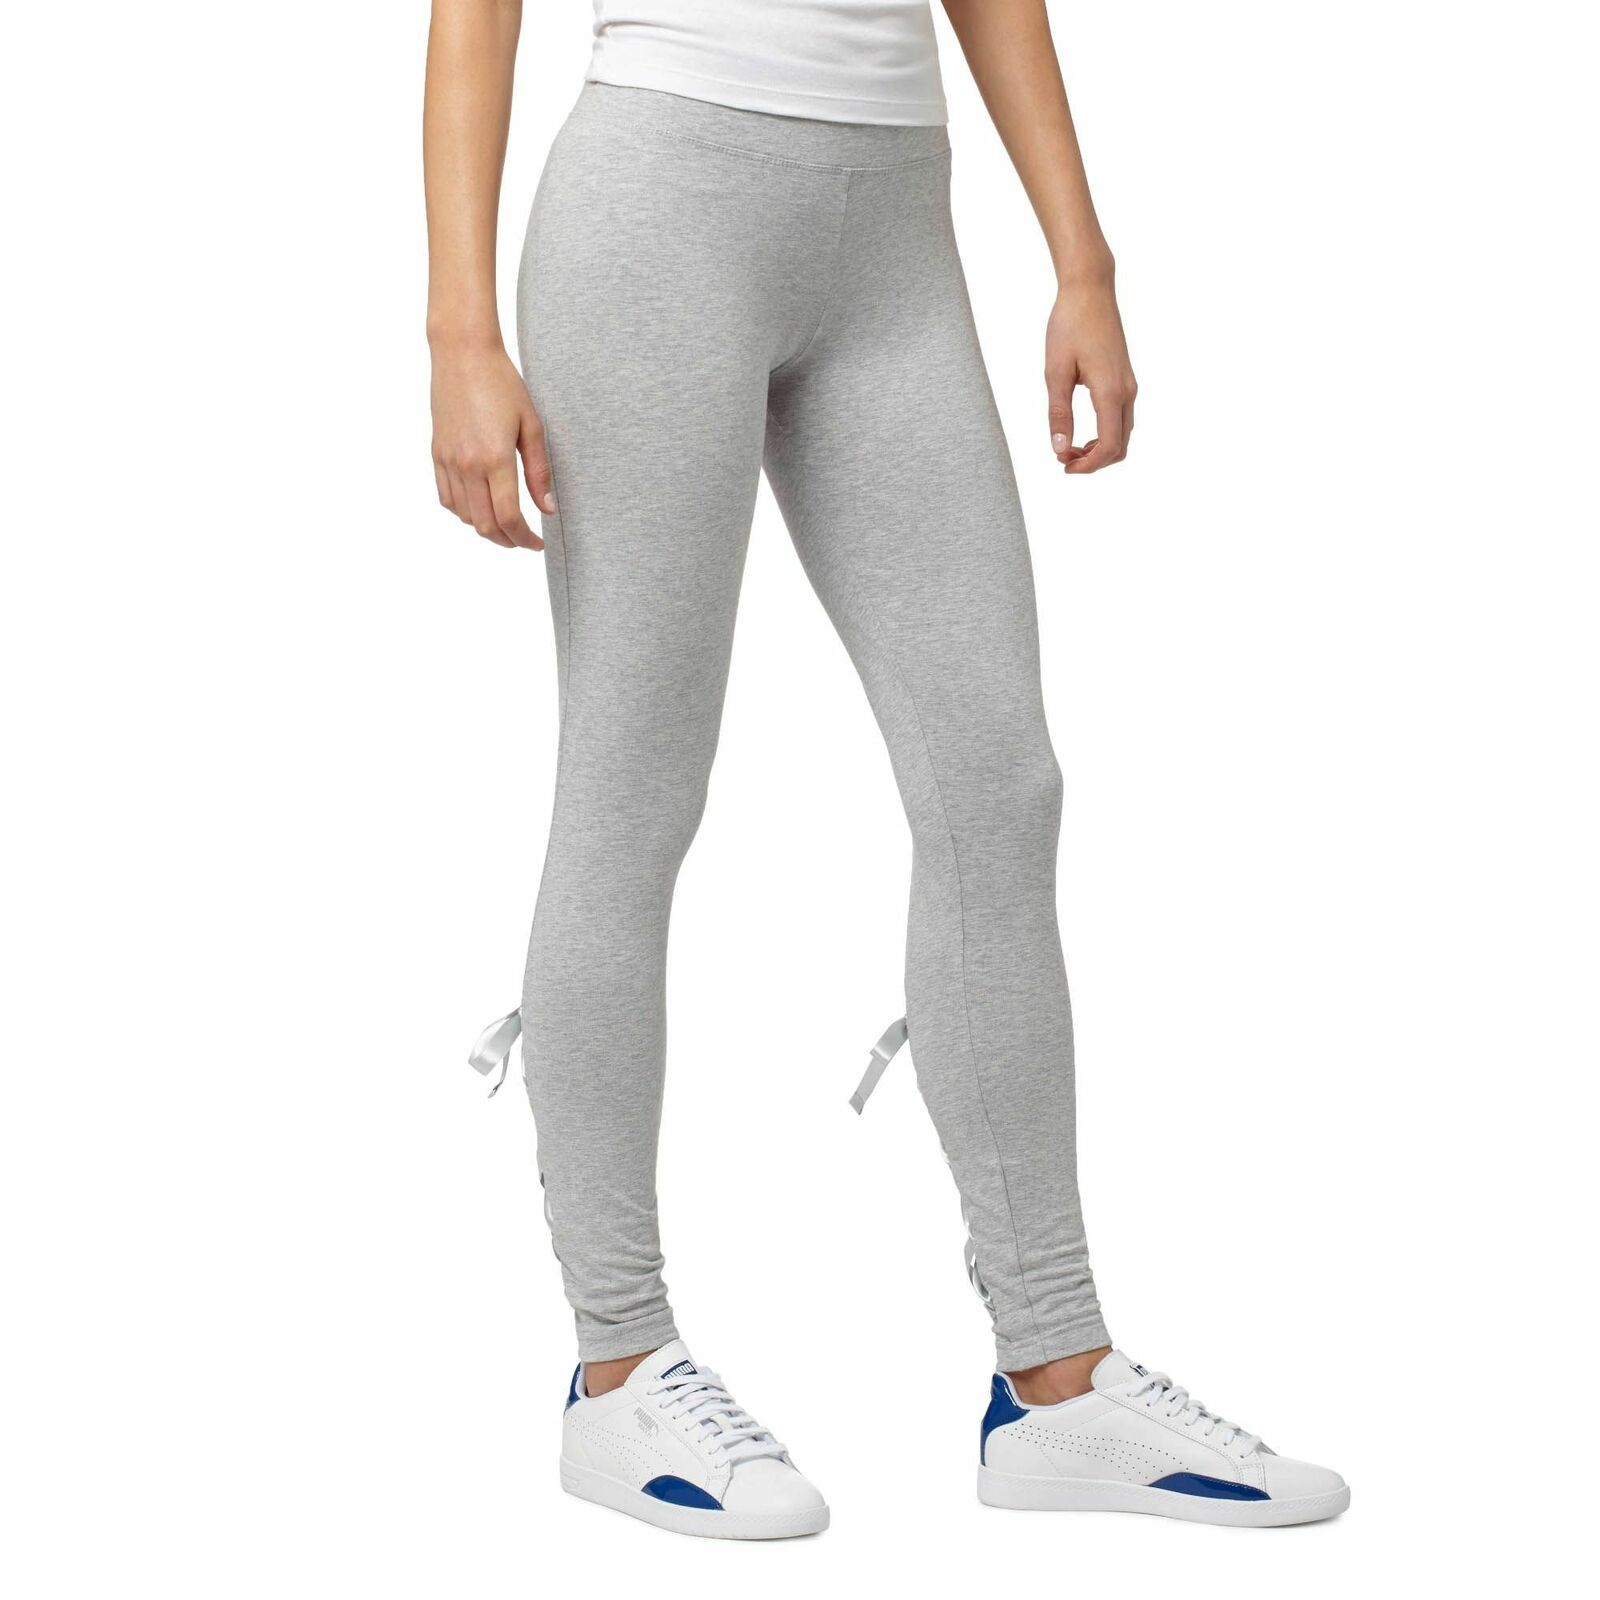 PUMA Satin T7 Leggings Women   Light Grey Heather (573903-01)